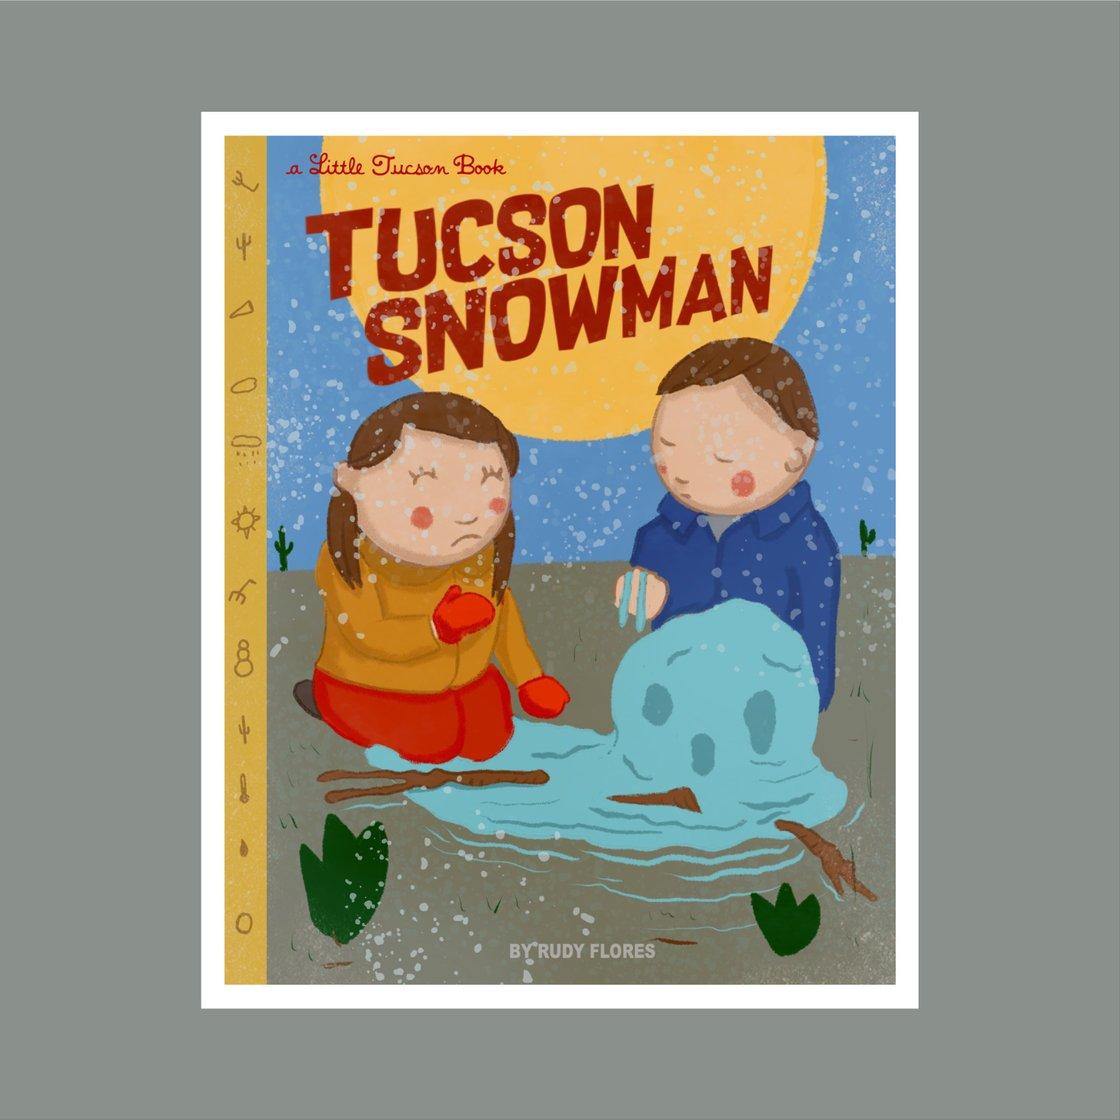 Image of Tucson Snowman